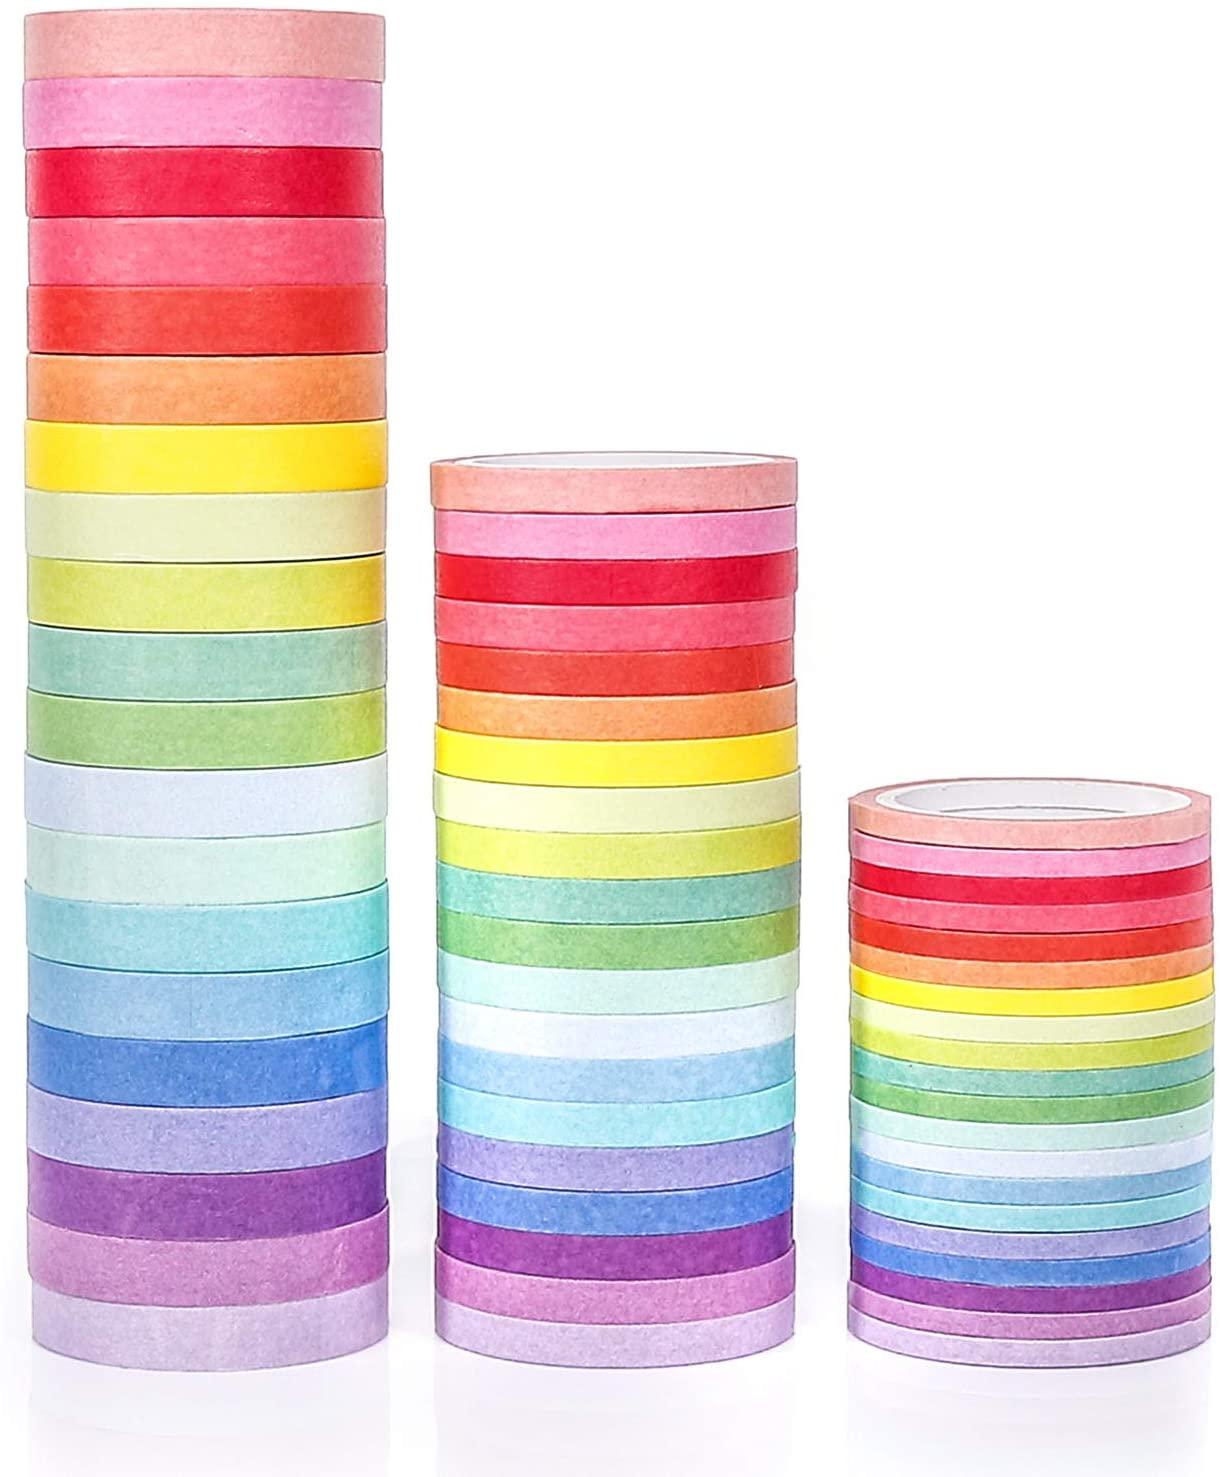 PuTwo Washi Tape, 60 Rolls Pastel Washi Tape, 3mm/5mm/8mm Thin Washi Tape Set, Decorative Tape, Cute Washi Tape, Washi Tapes, Japanese Washi Tape, Washi Tape for Journal, Decorative Tape for Crafts